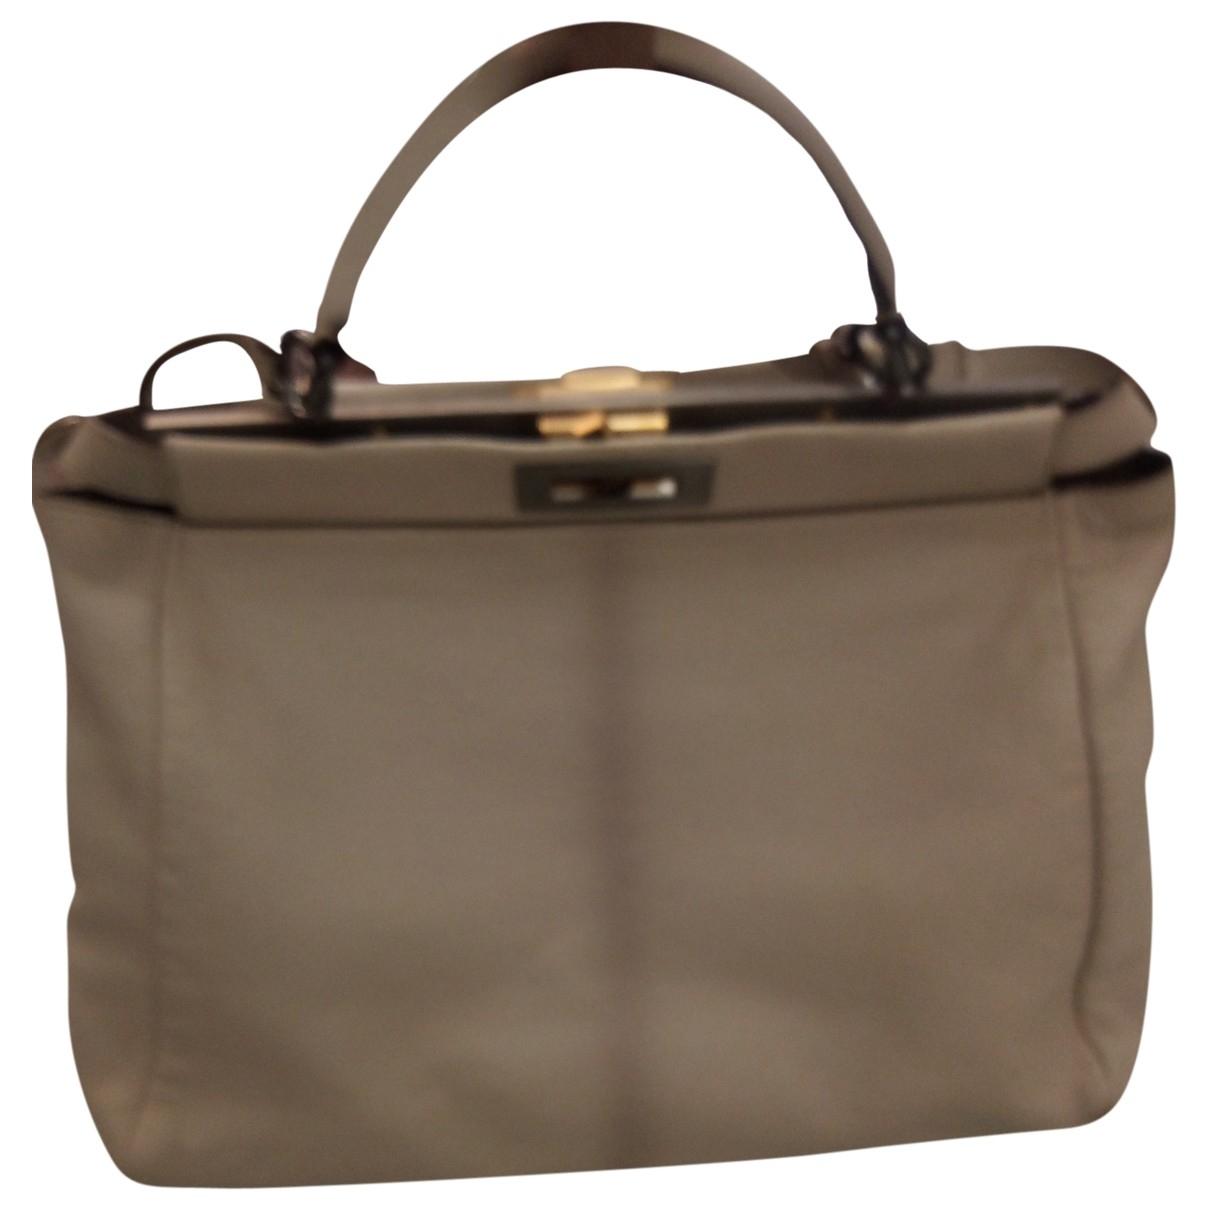 Fendi Peekaboo Handtasche in  Beige Leder